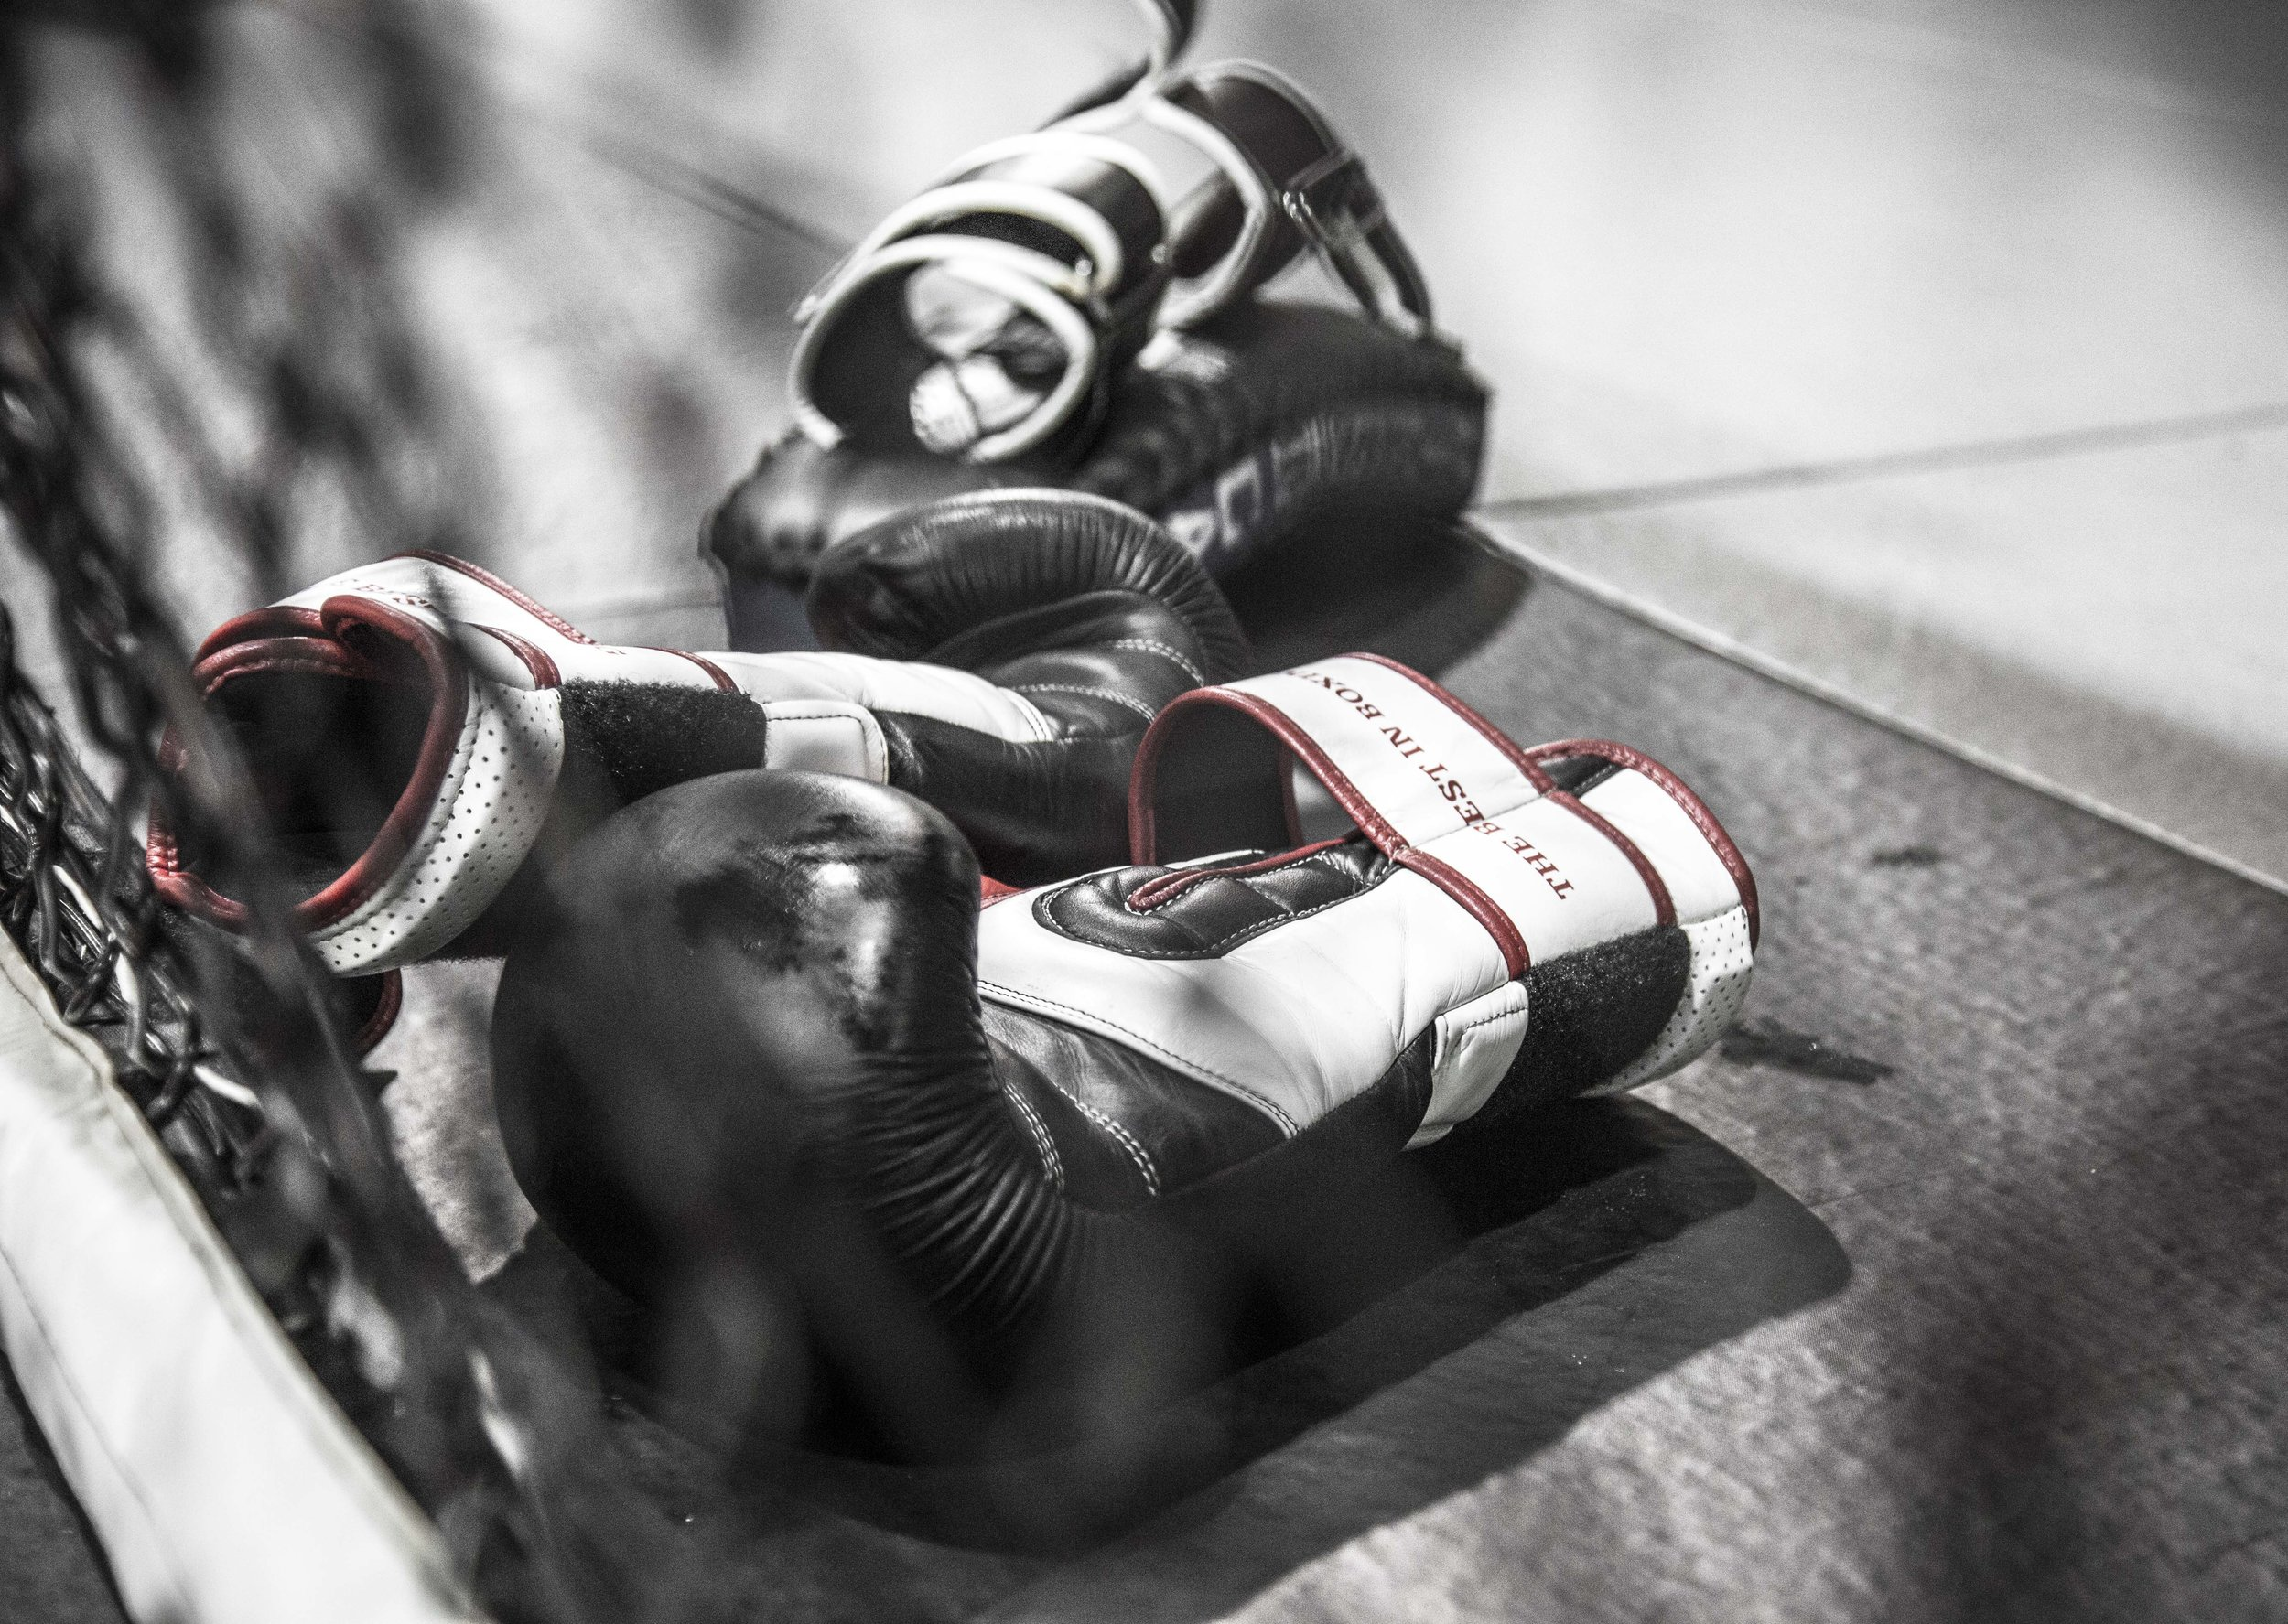 muay thai detail glove.JPG